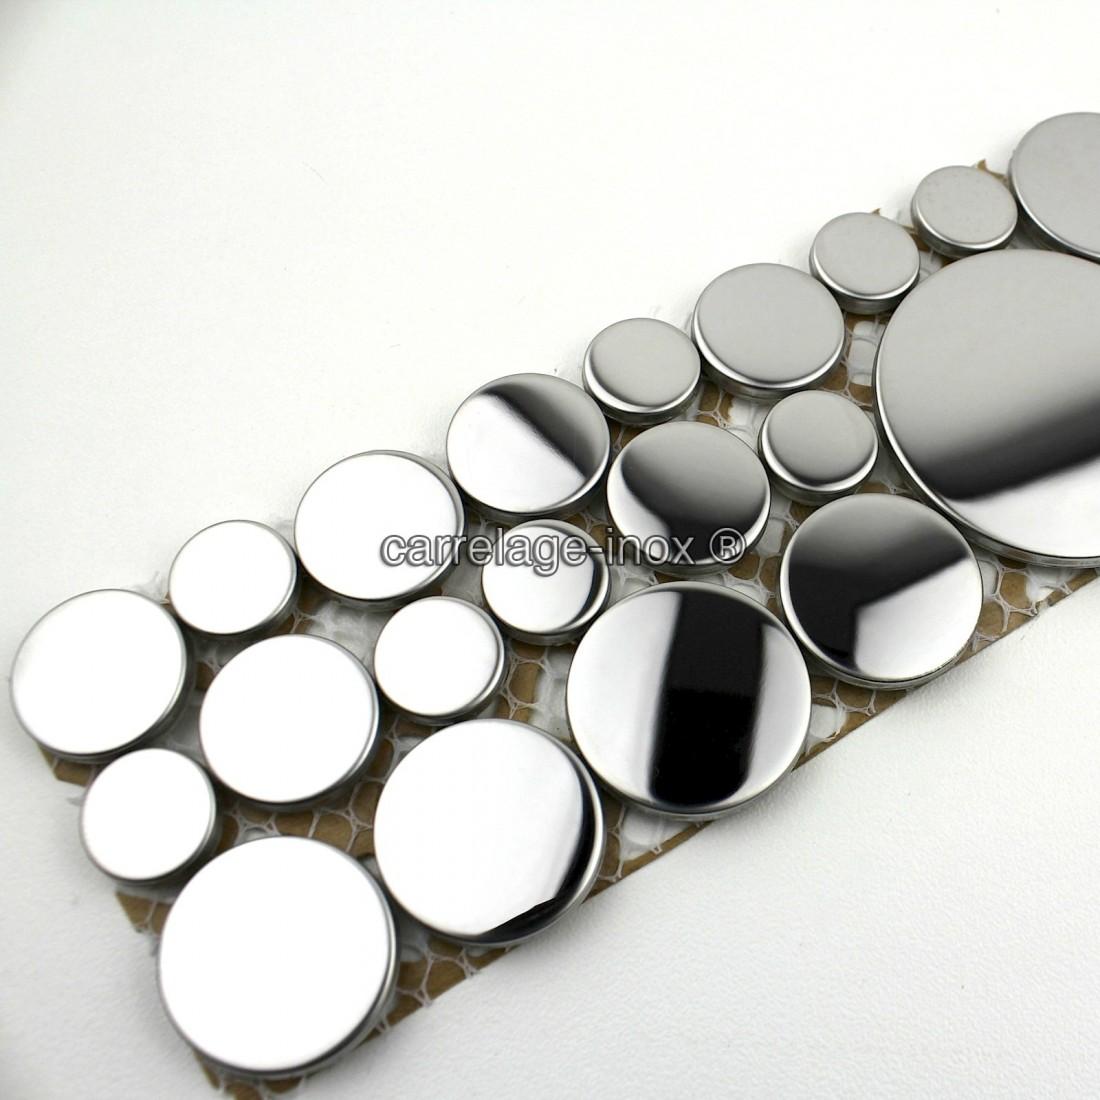 Frise miroir frise miroir sur enperdresonlapin